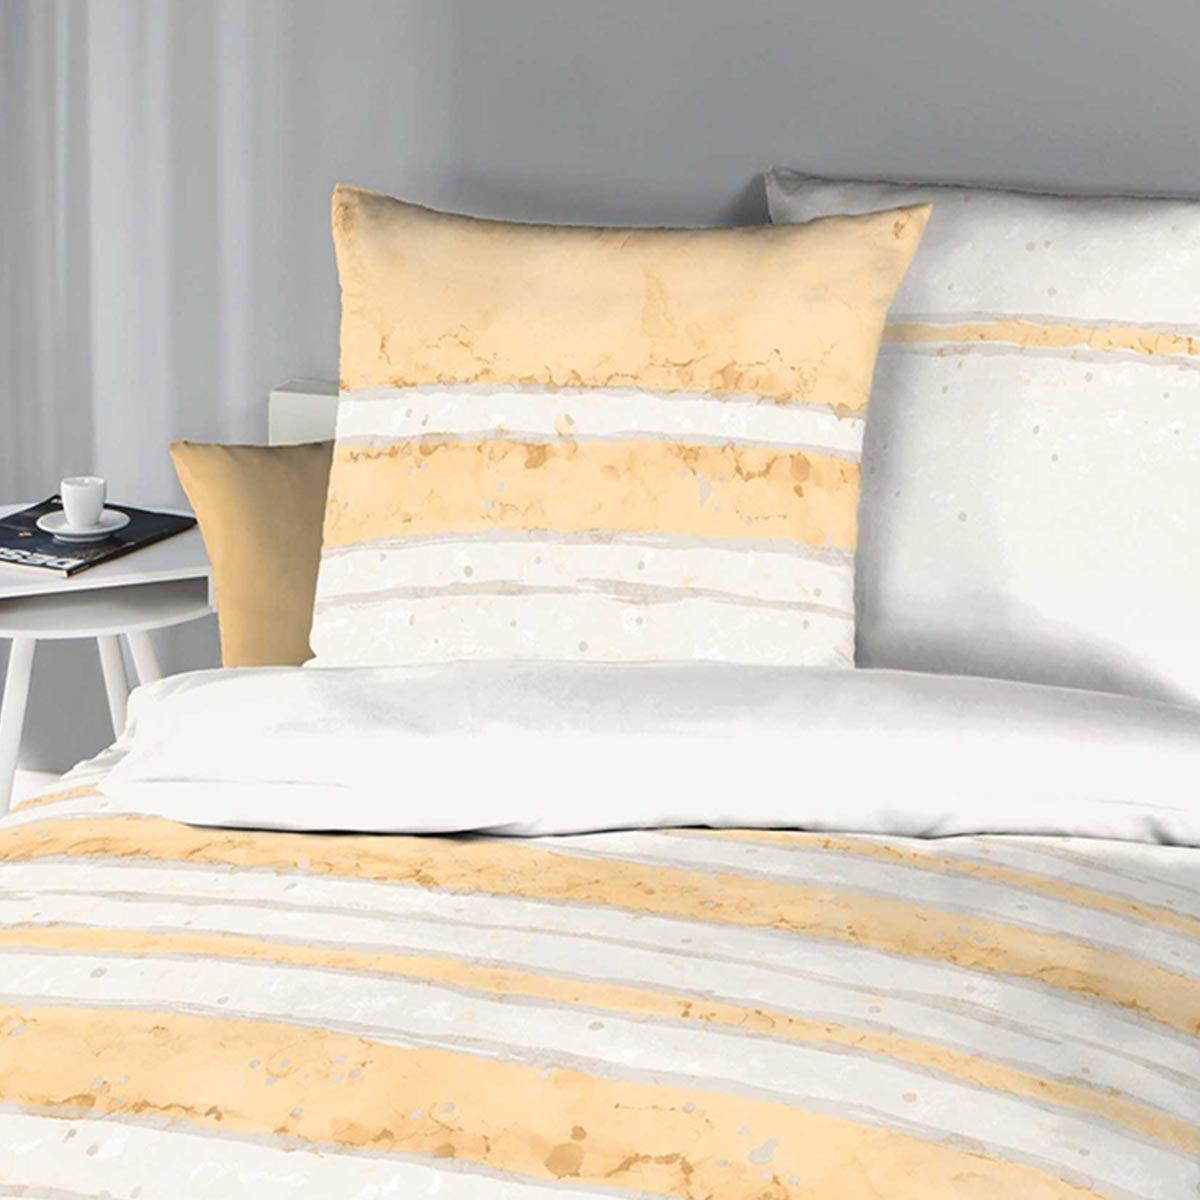 kaeppel biber bettw sche aquarello pfirsich g nstig online kaufen bei bettwaren shop. Black Bedroom Furniture Sets. Home Design Ideas